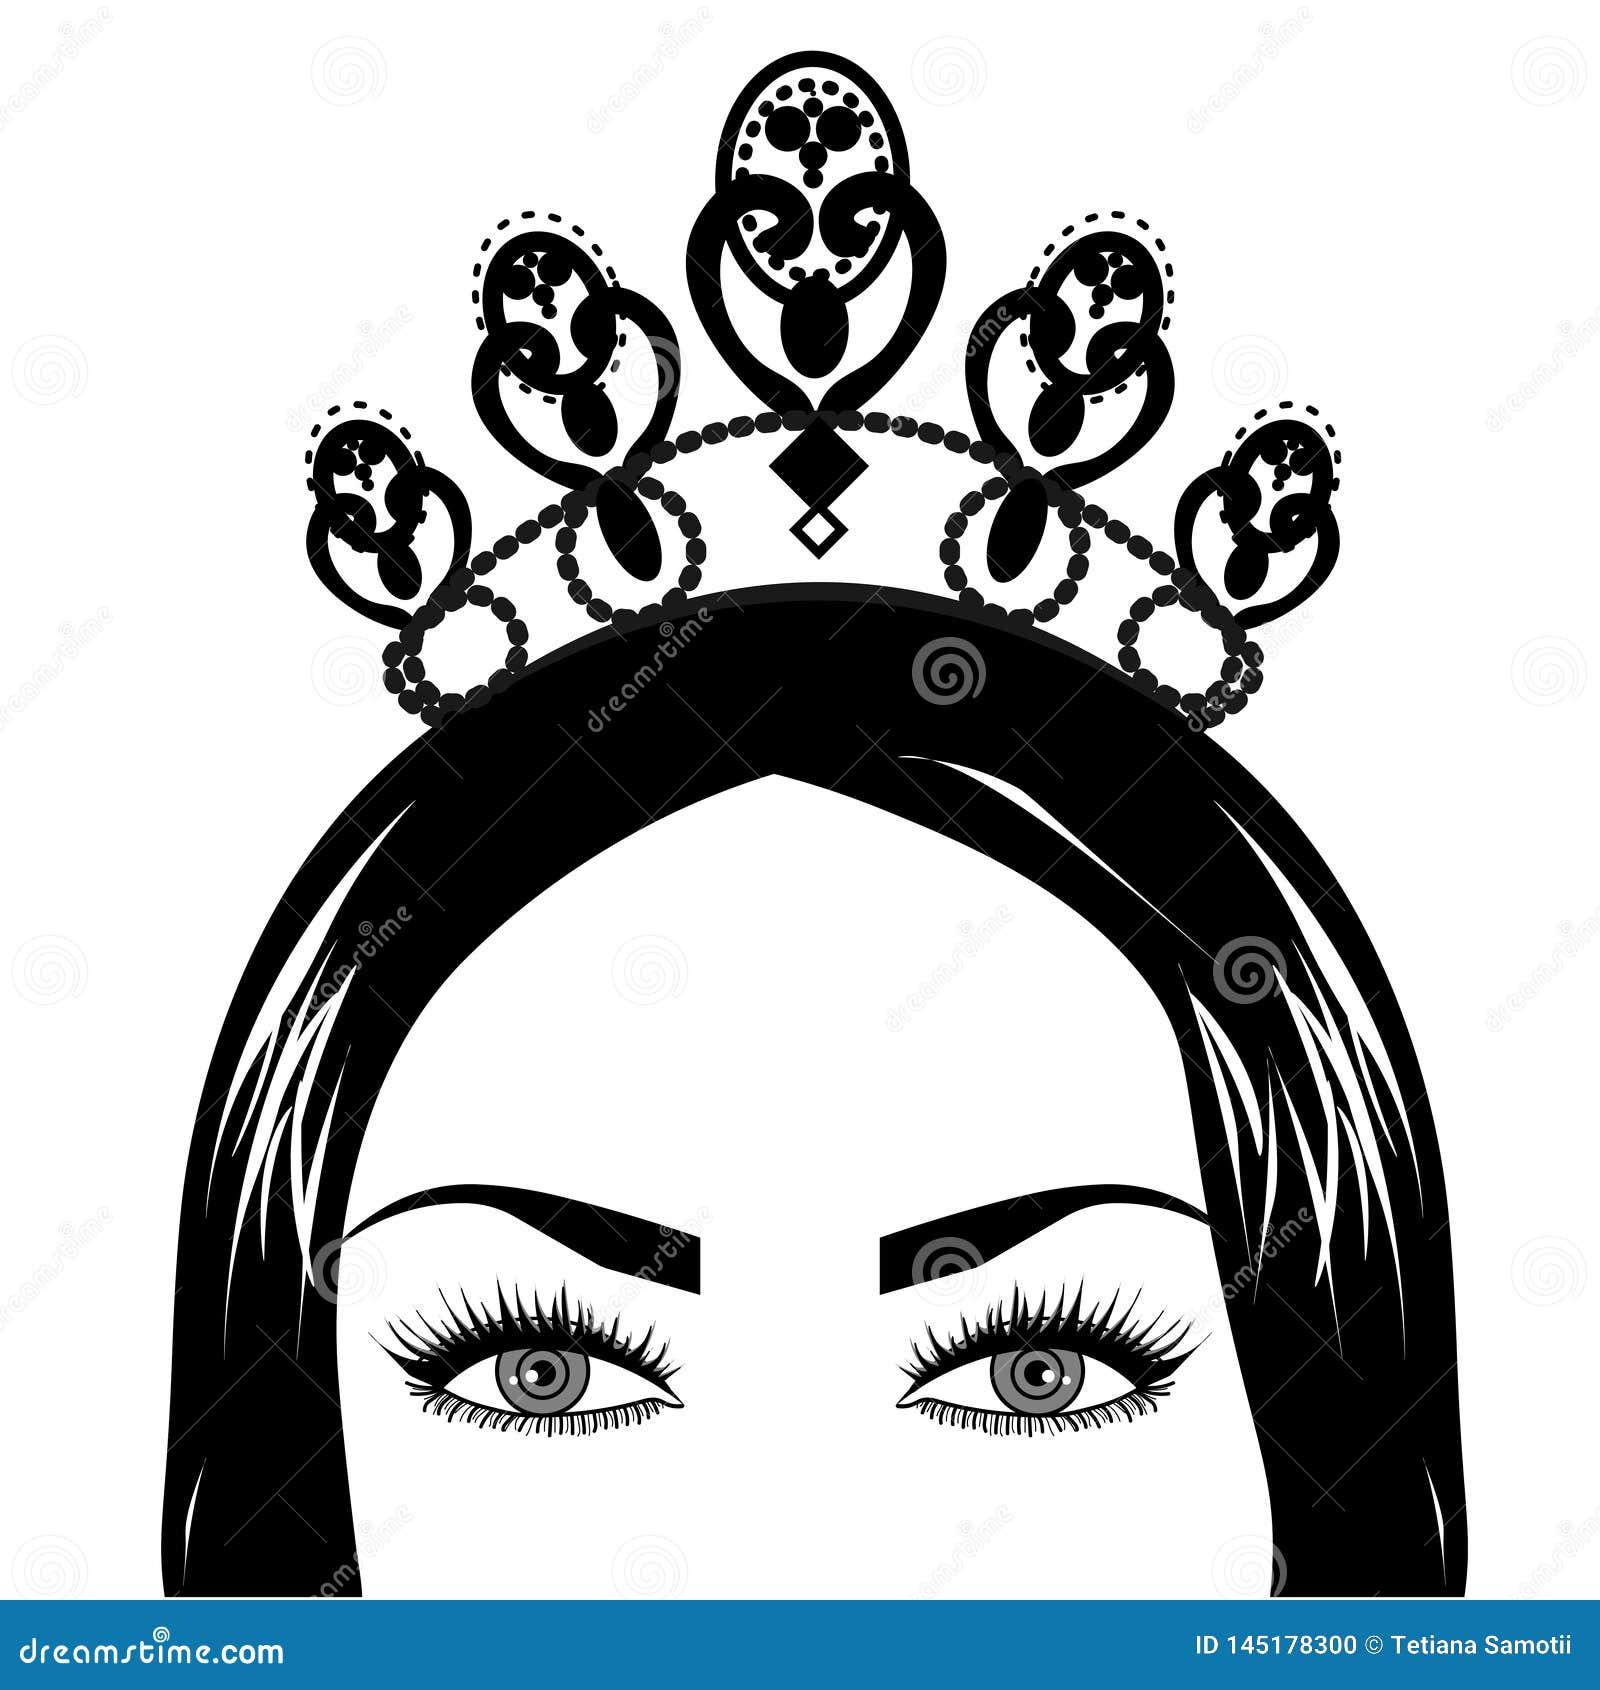 Logotipo de la reina y de la corona de la web